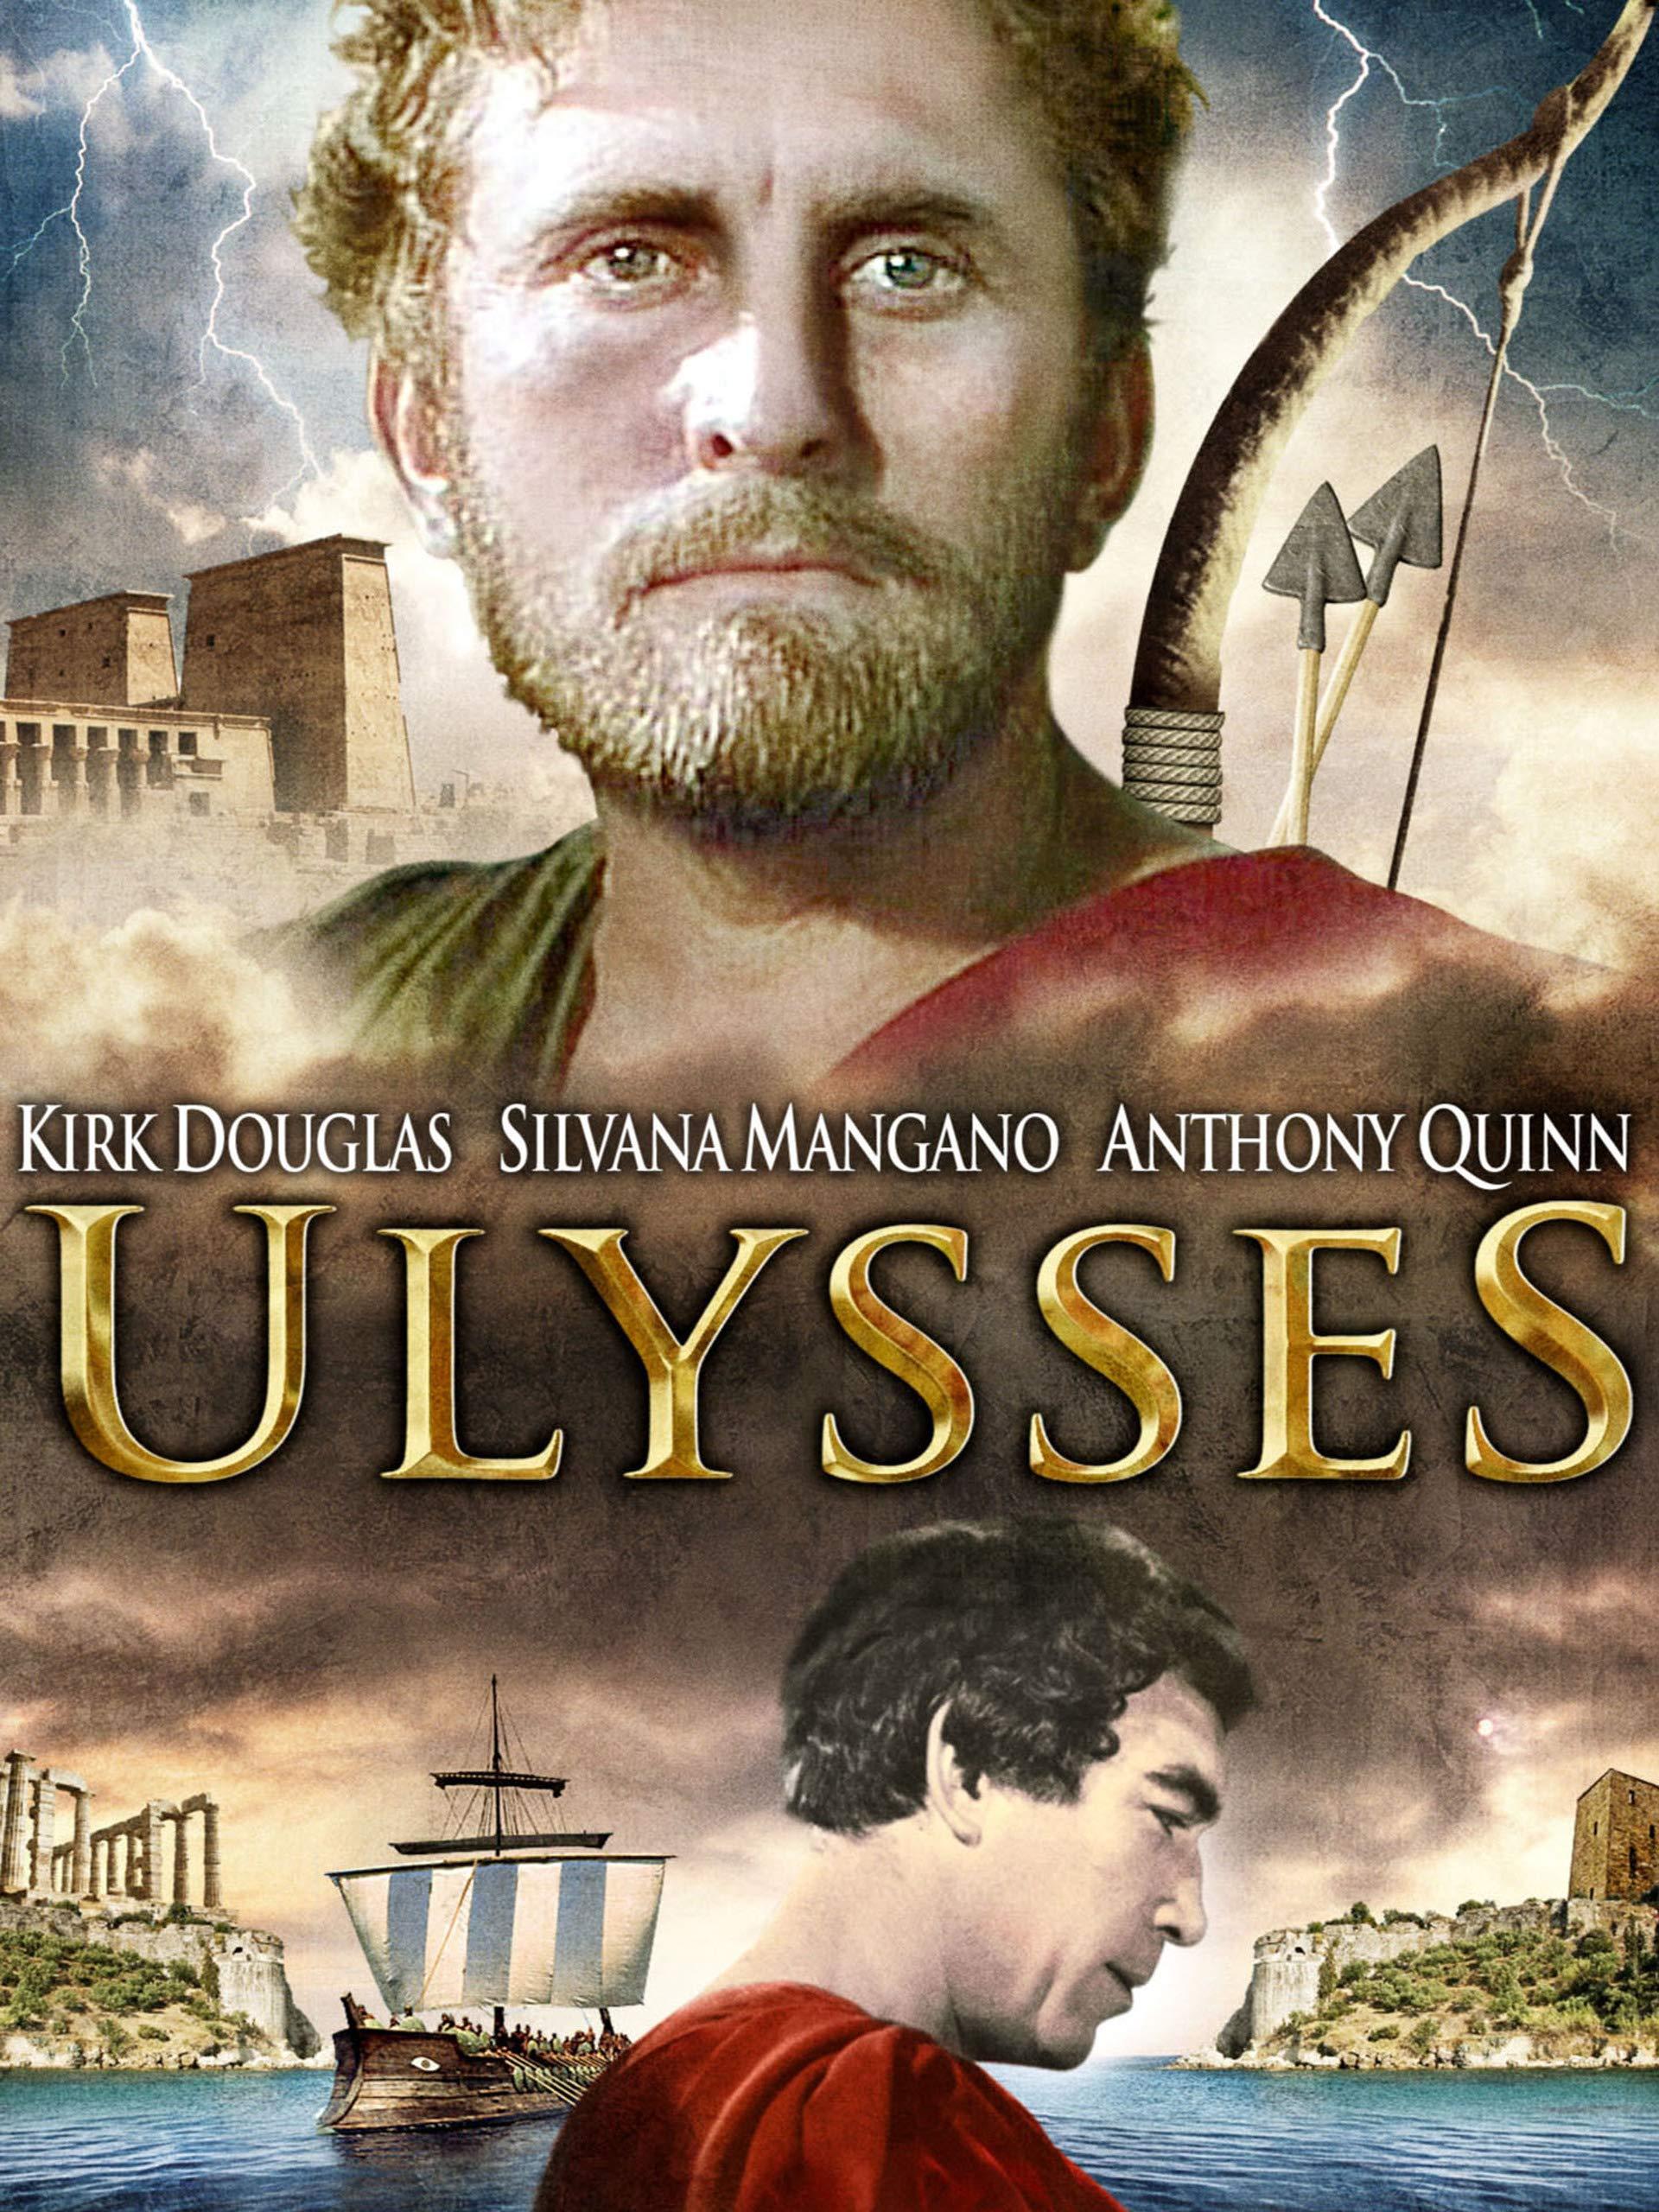 Watch Ulysses 1954 Prime Video